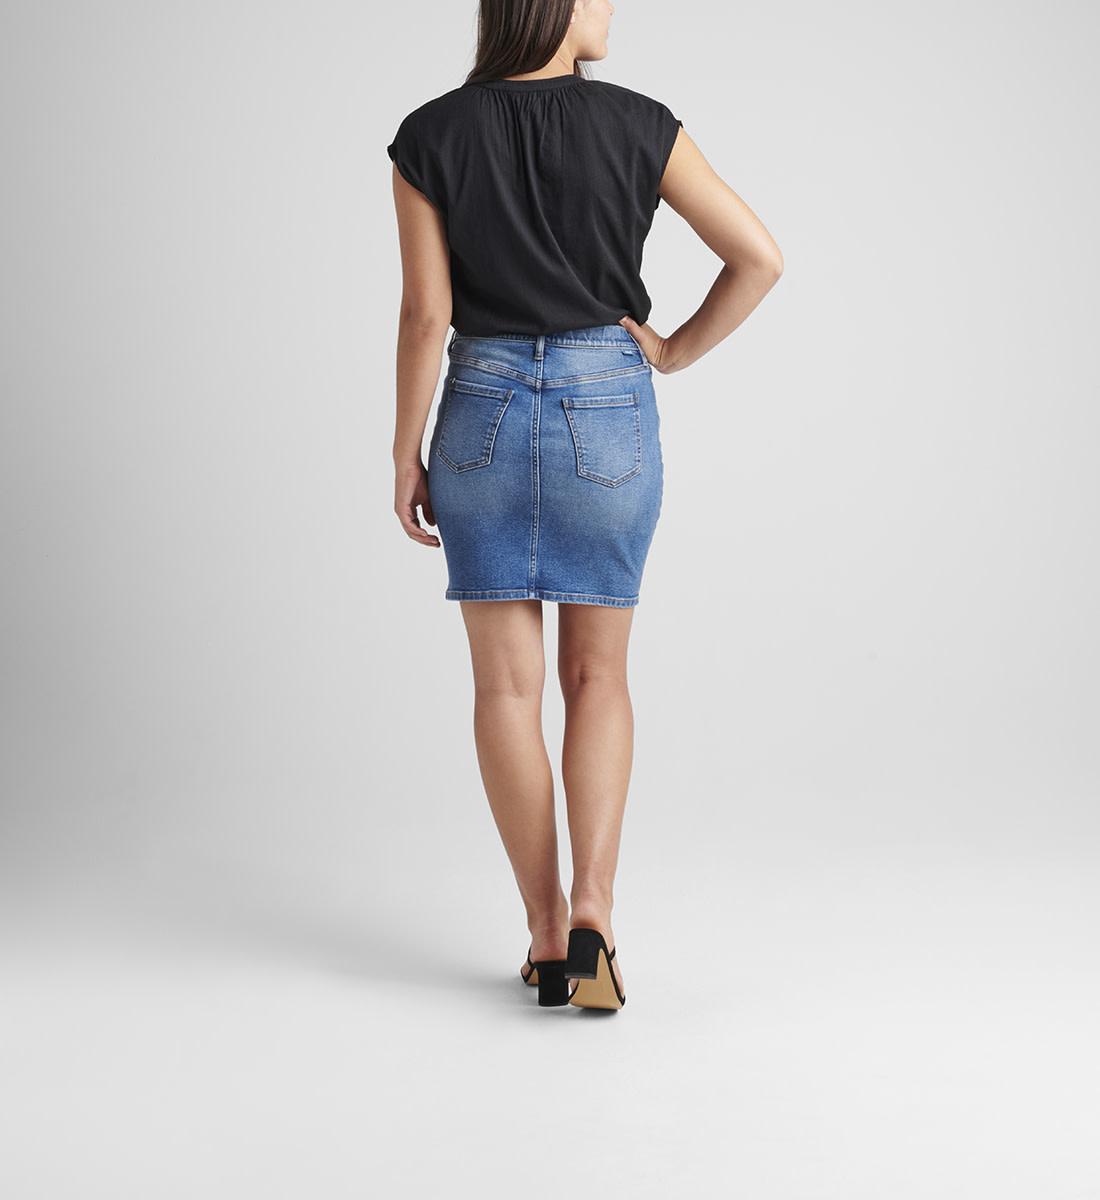 Pull-On Stretch Denim Skirt